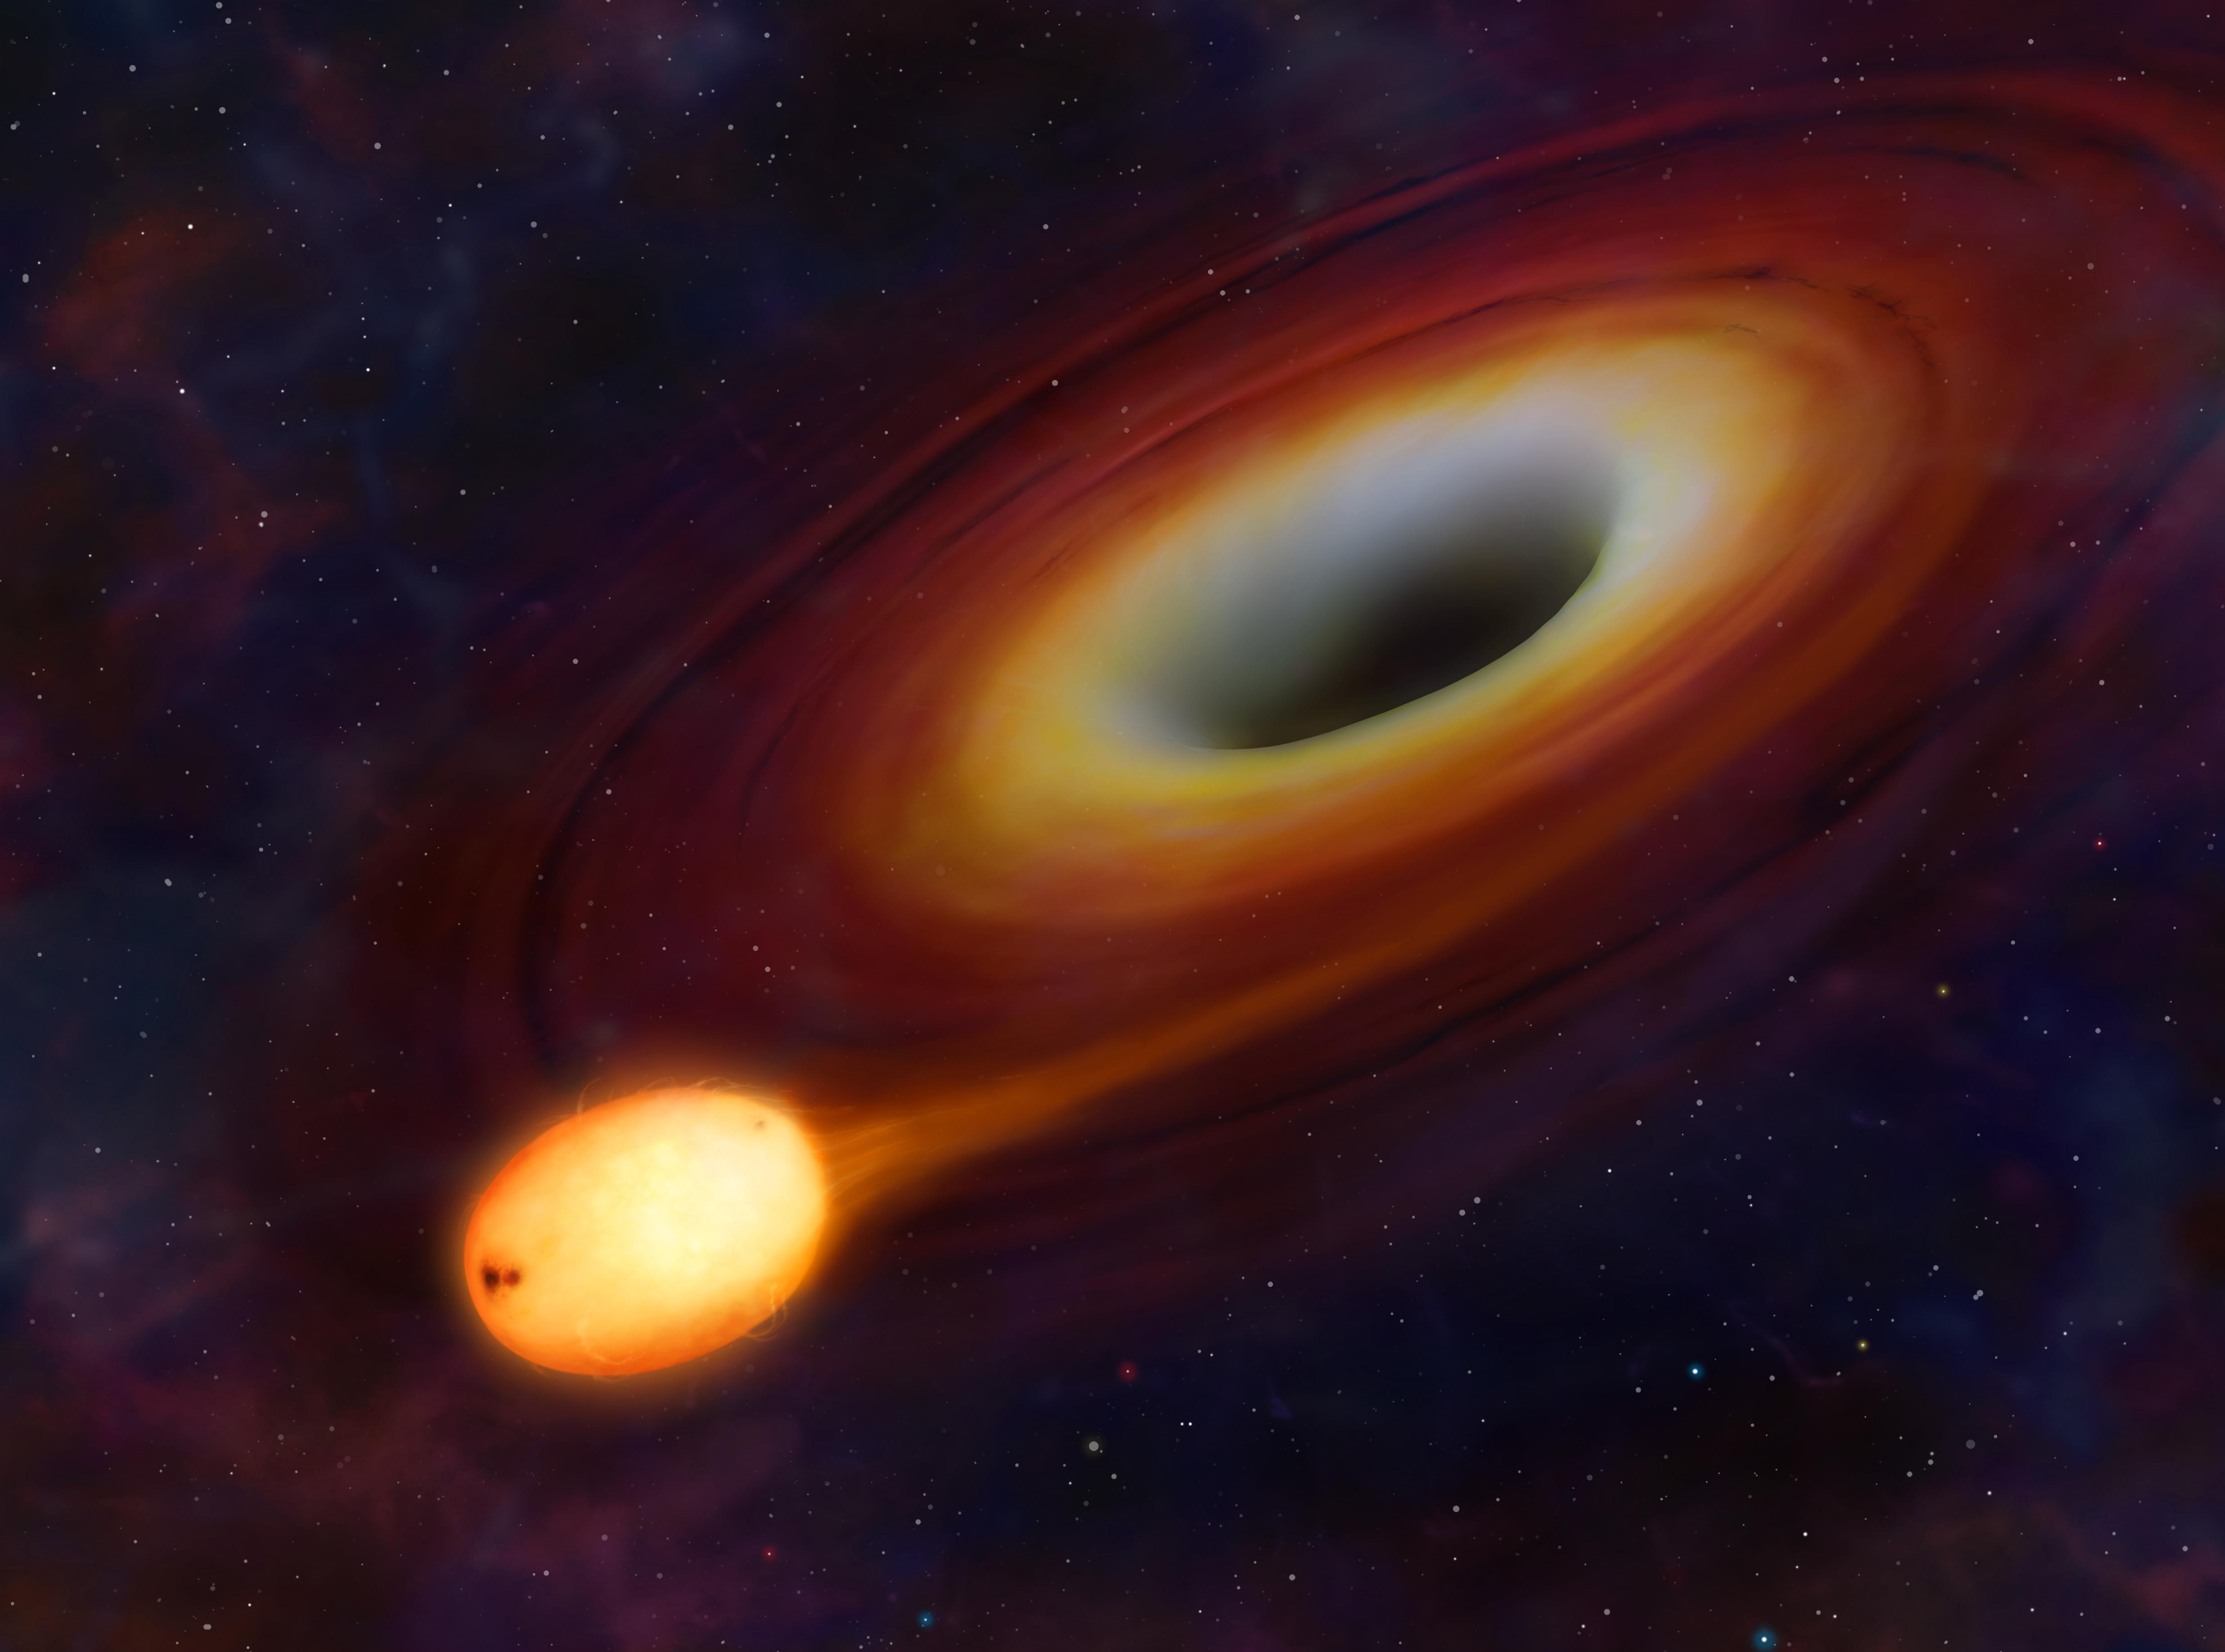 University of Warwick - Black hole kills star and blasts 3 ...